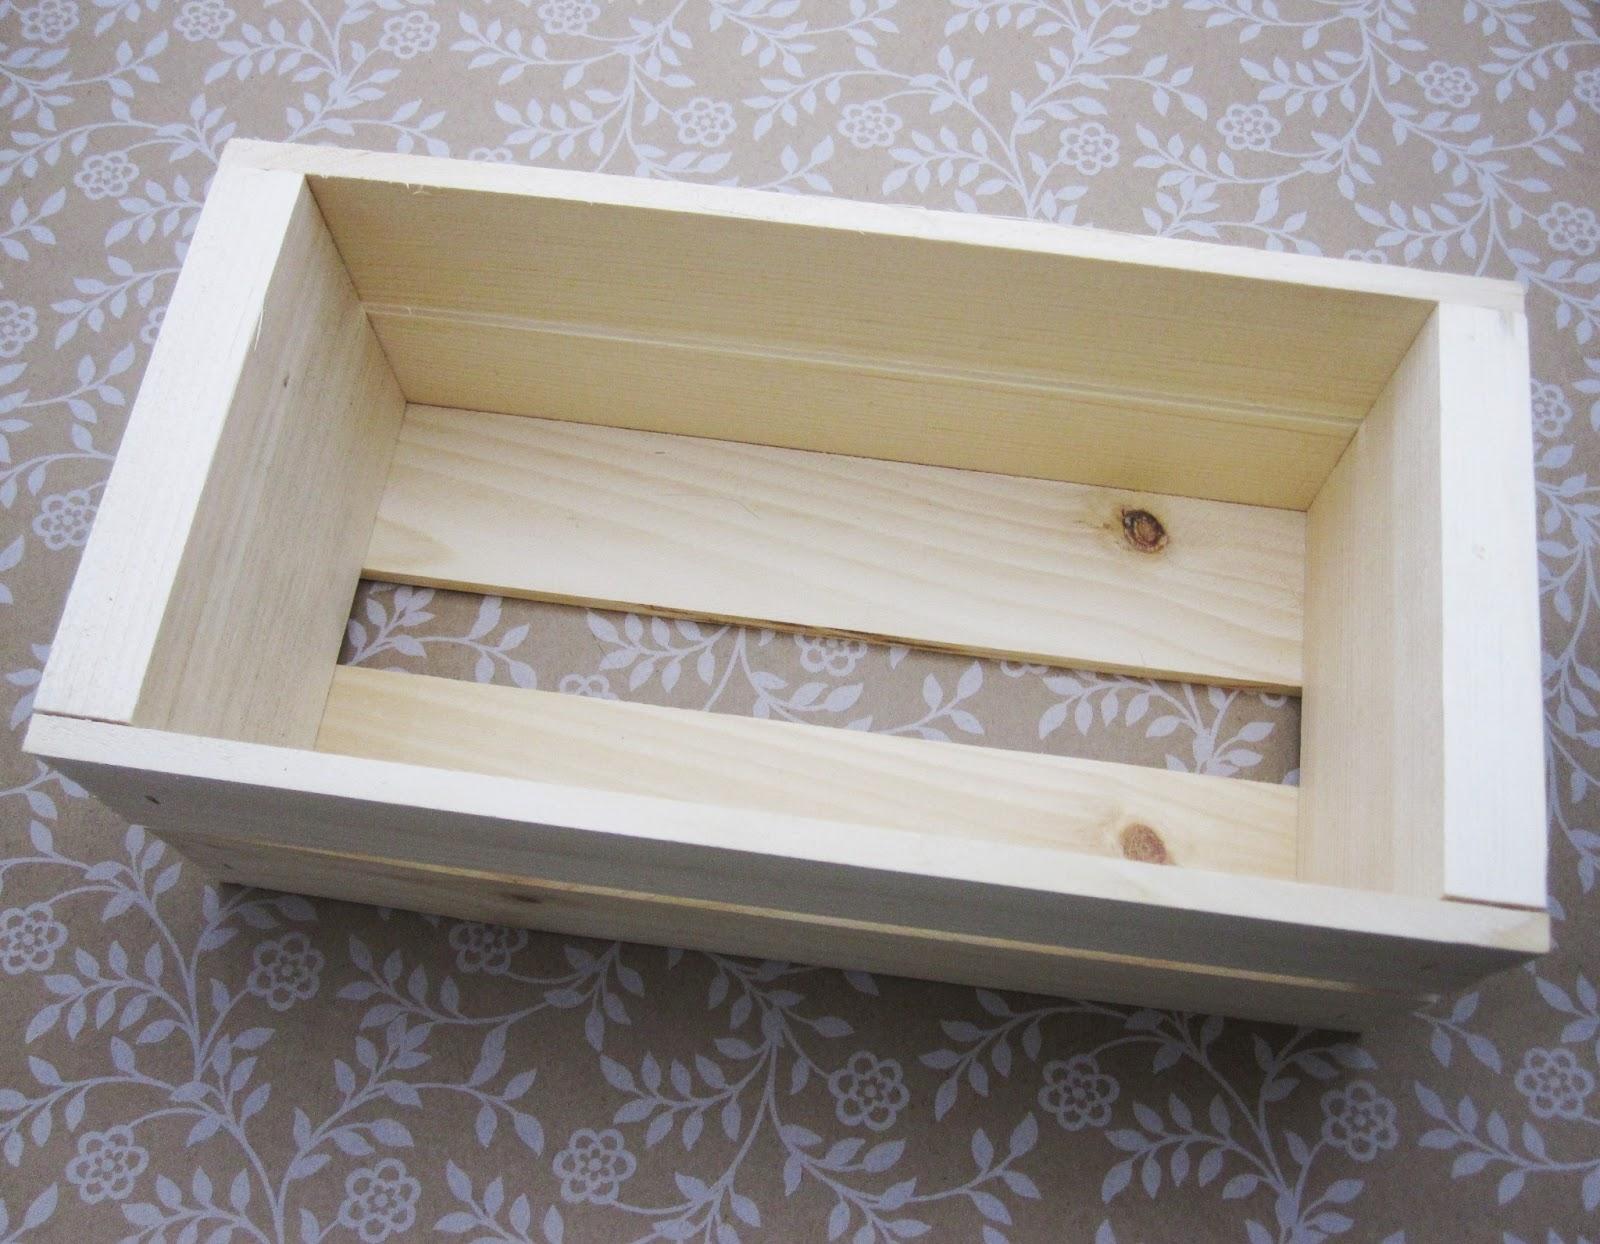 The botanical box diy wood planter box for Diy decorative wood boxes